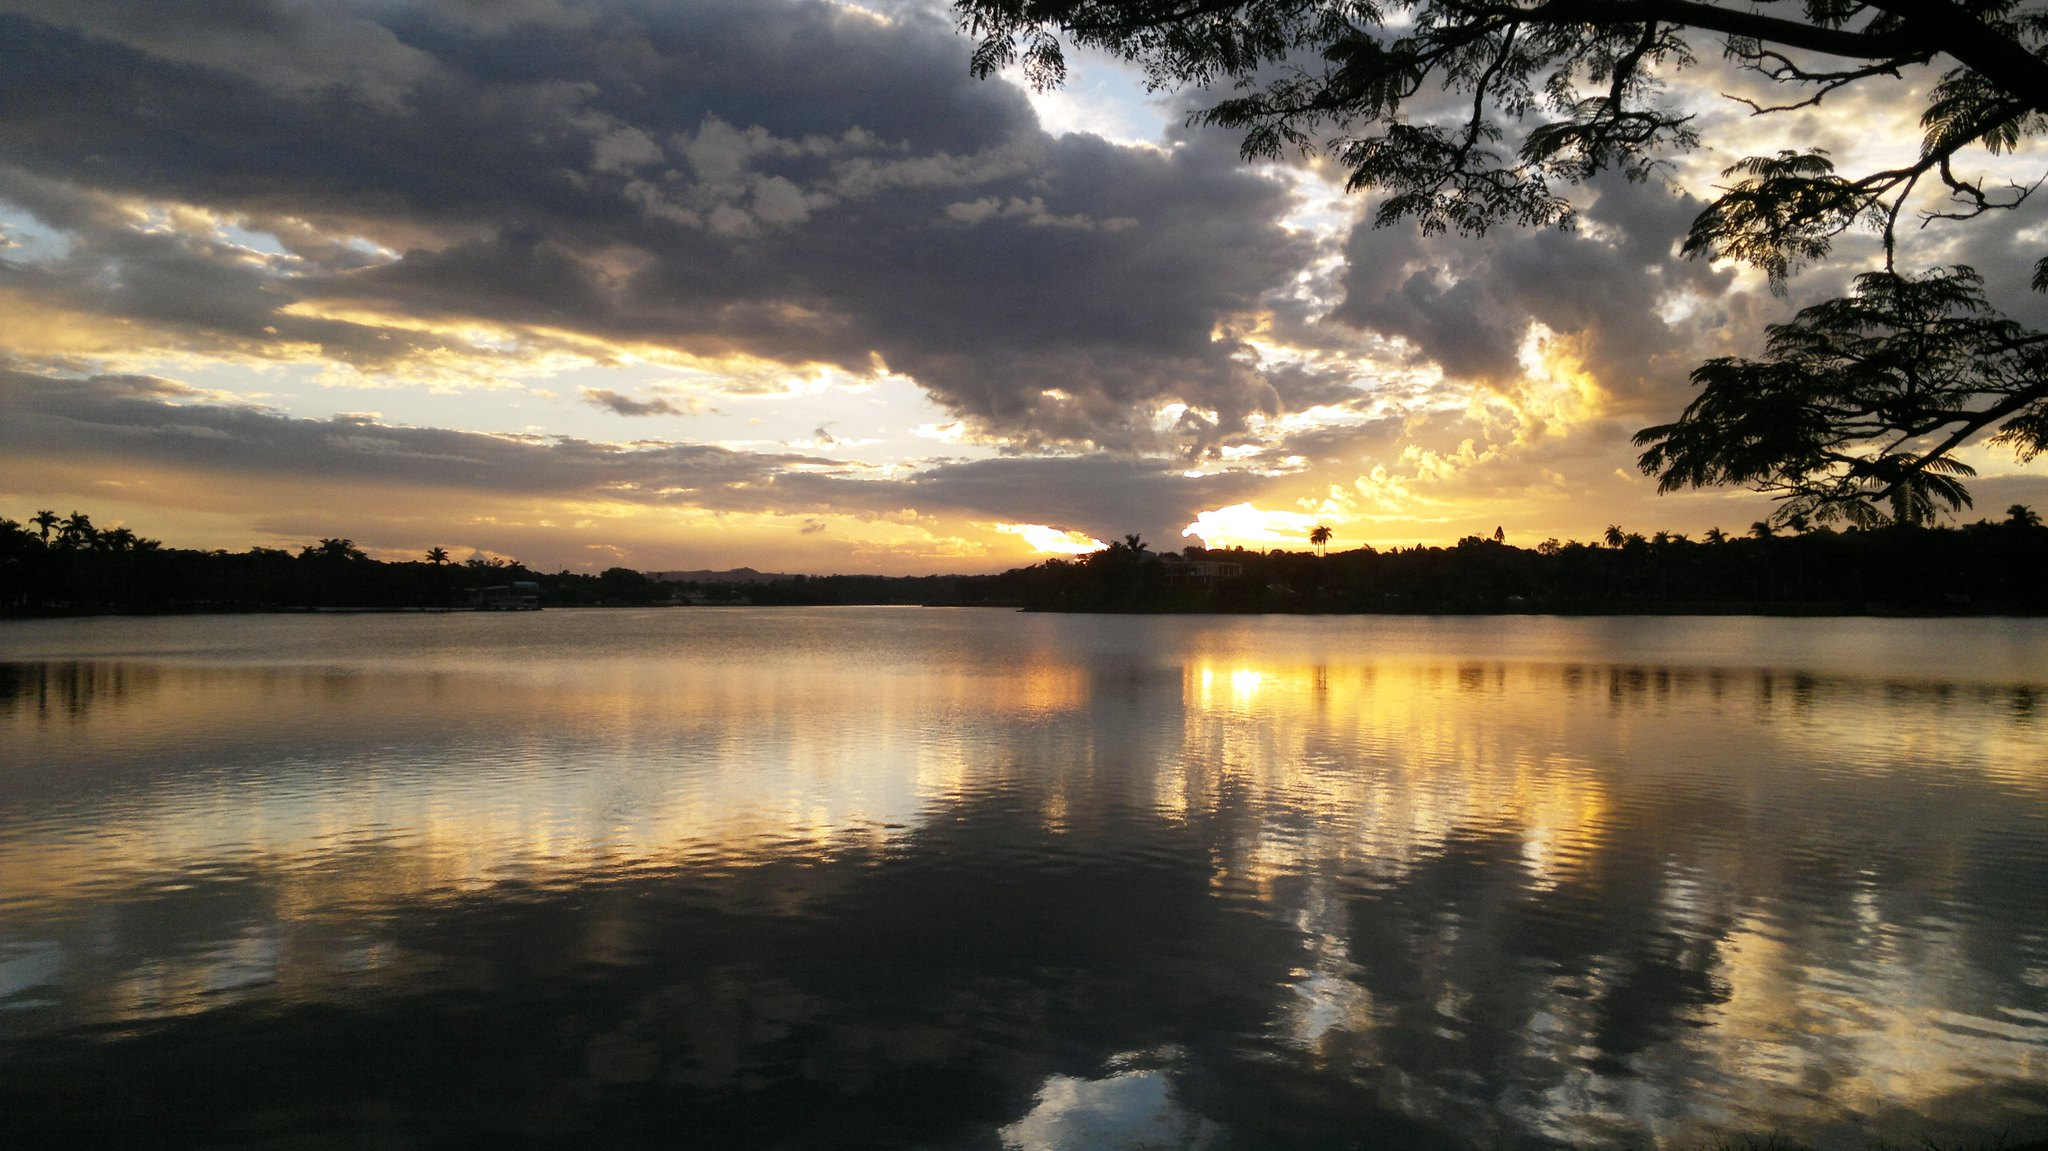 Pôr do Sol na Lagoa da Pampulha.